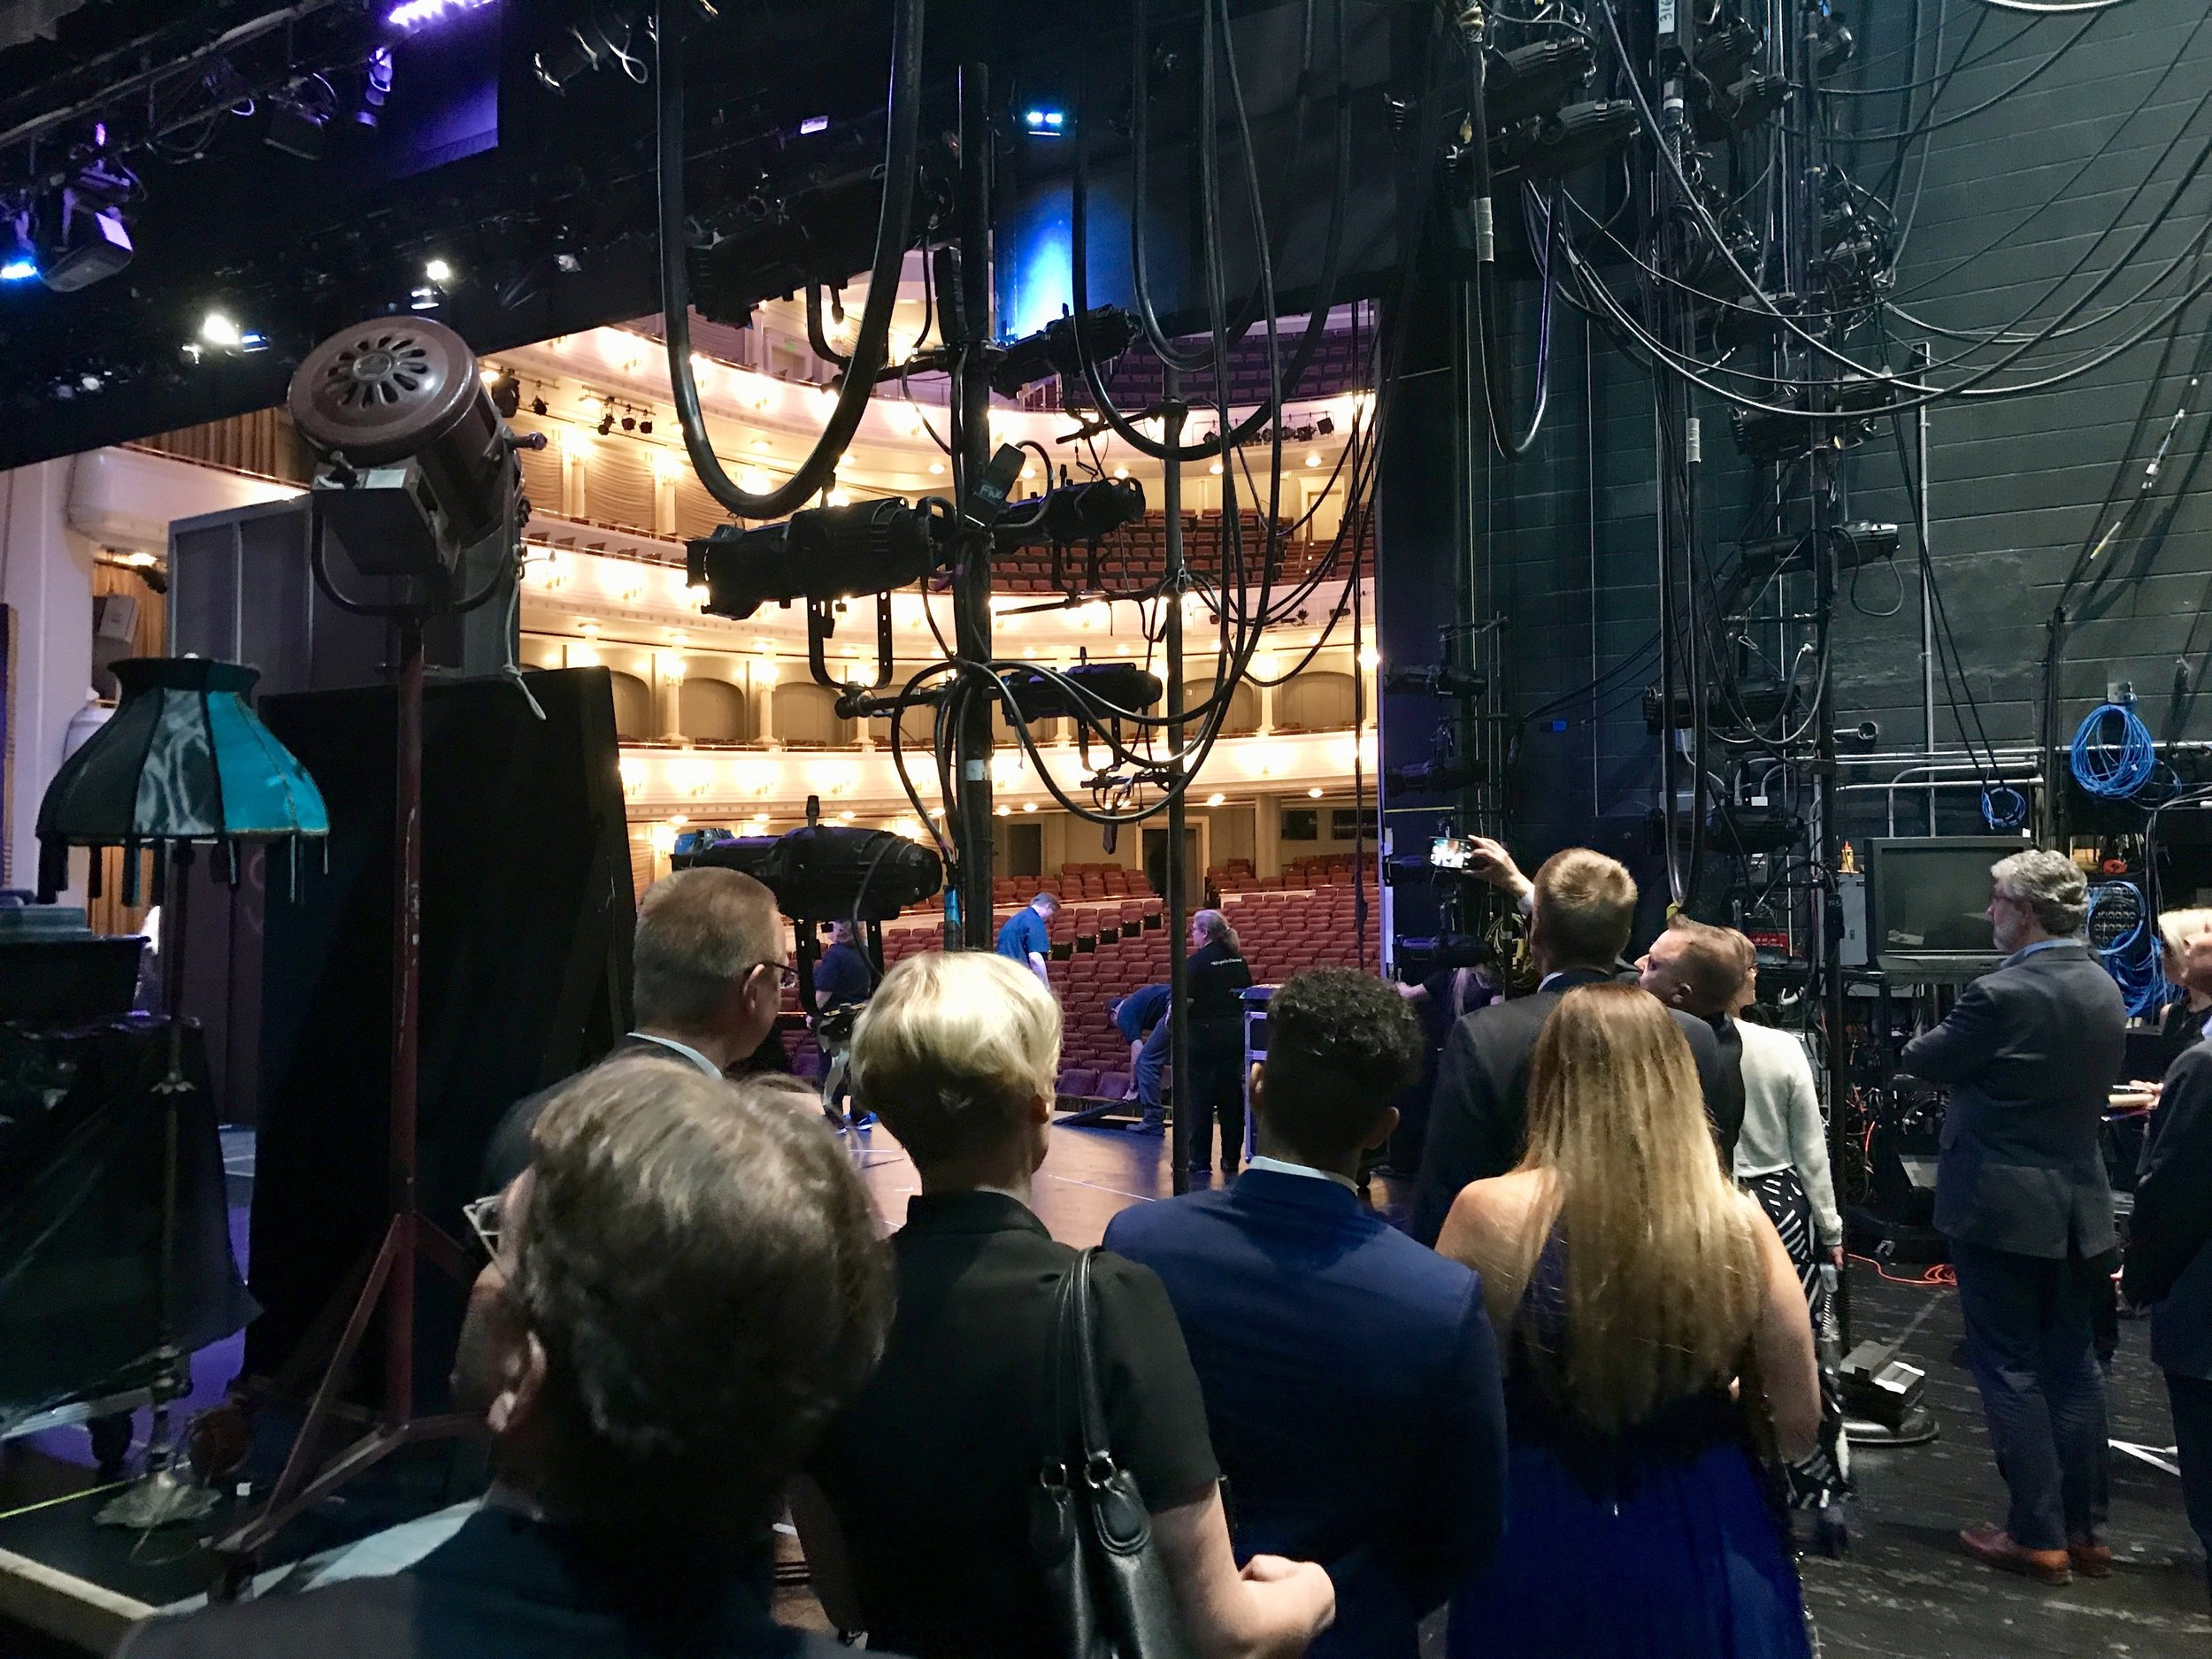 At the backstage - Photo by Vesa Jäämuru